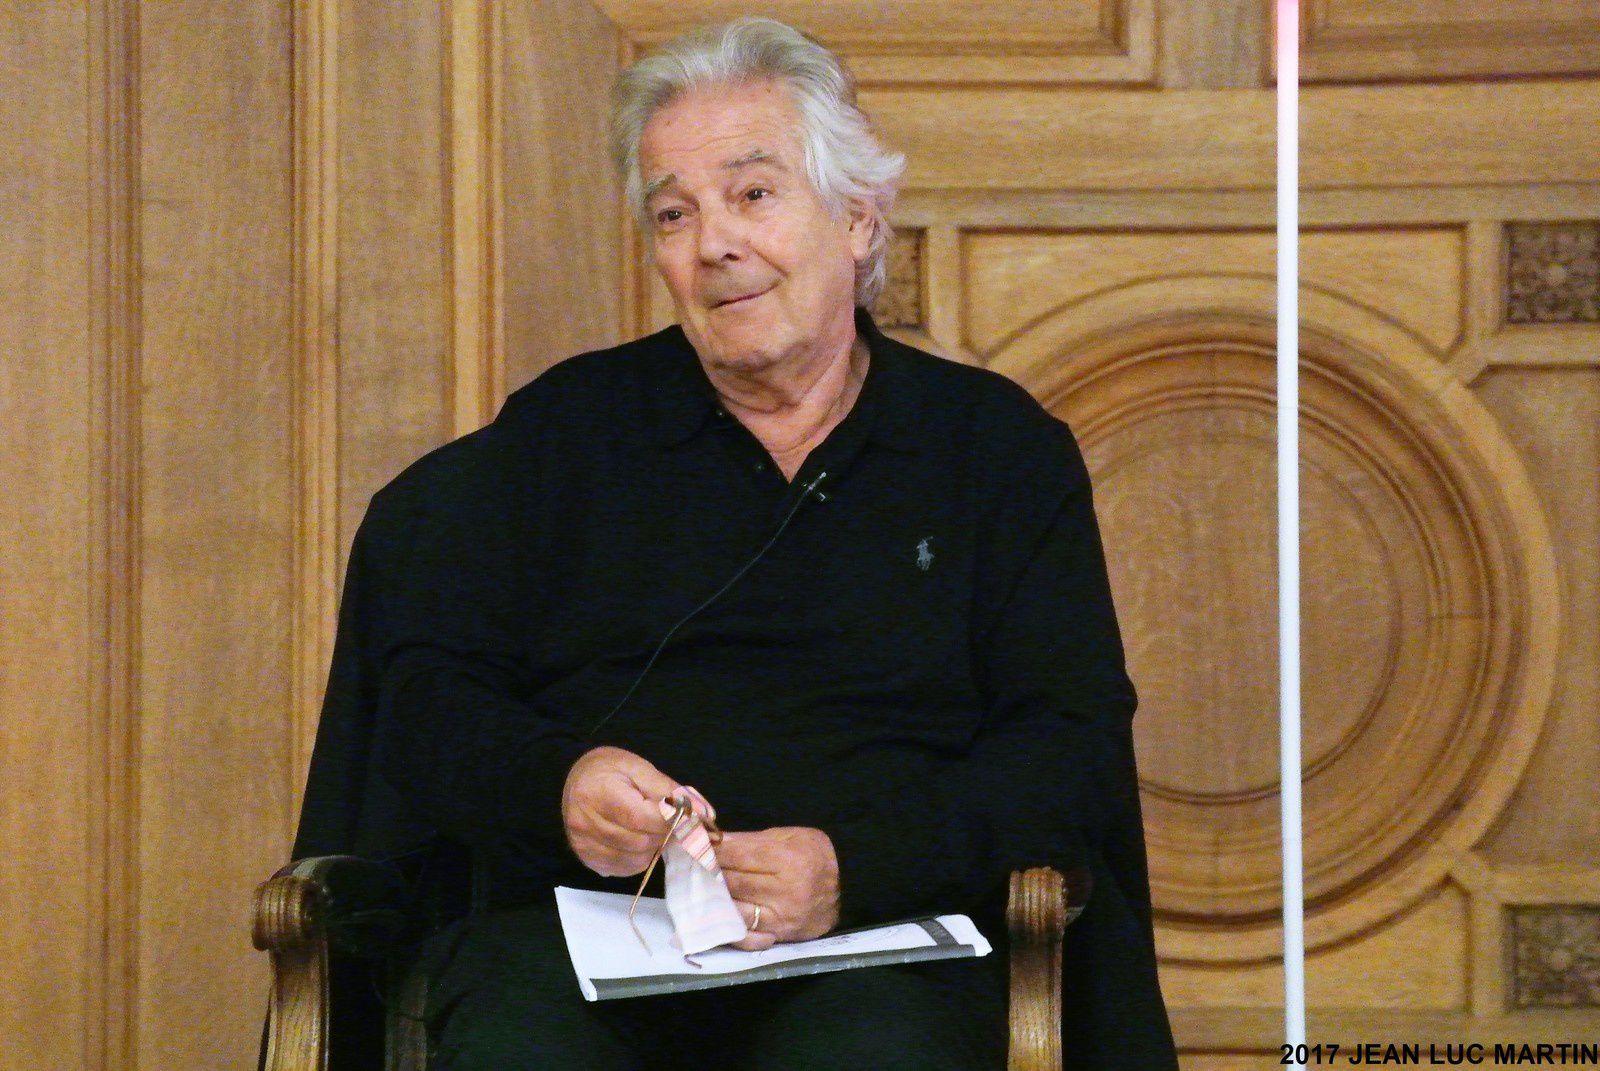 PIERRE ARDITI: LECTURE DE JOURNAUX INTIMES